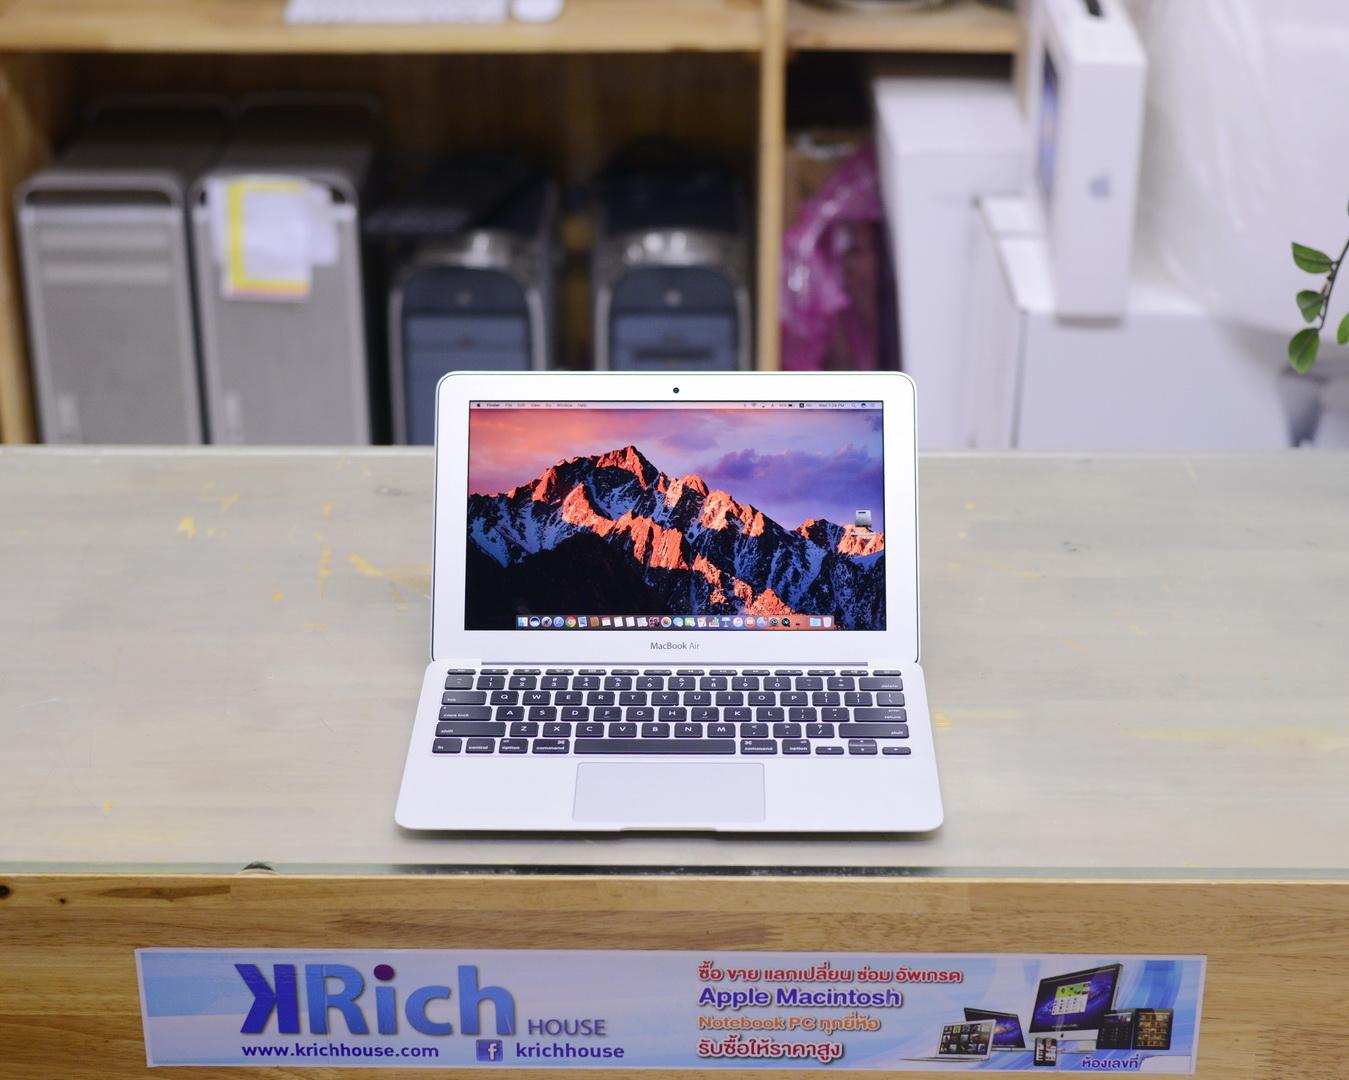 MacBook Air (11-inch Early 2014) Core i5 1.4GHz RAM 4GB SSD 128GB - English Keyboard